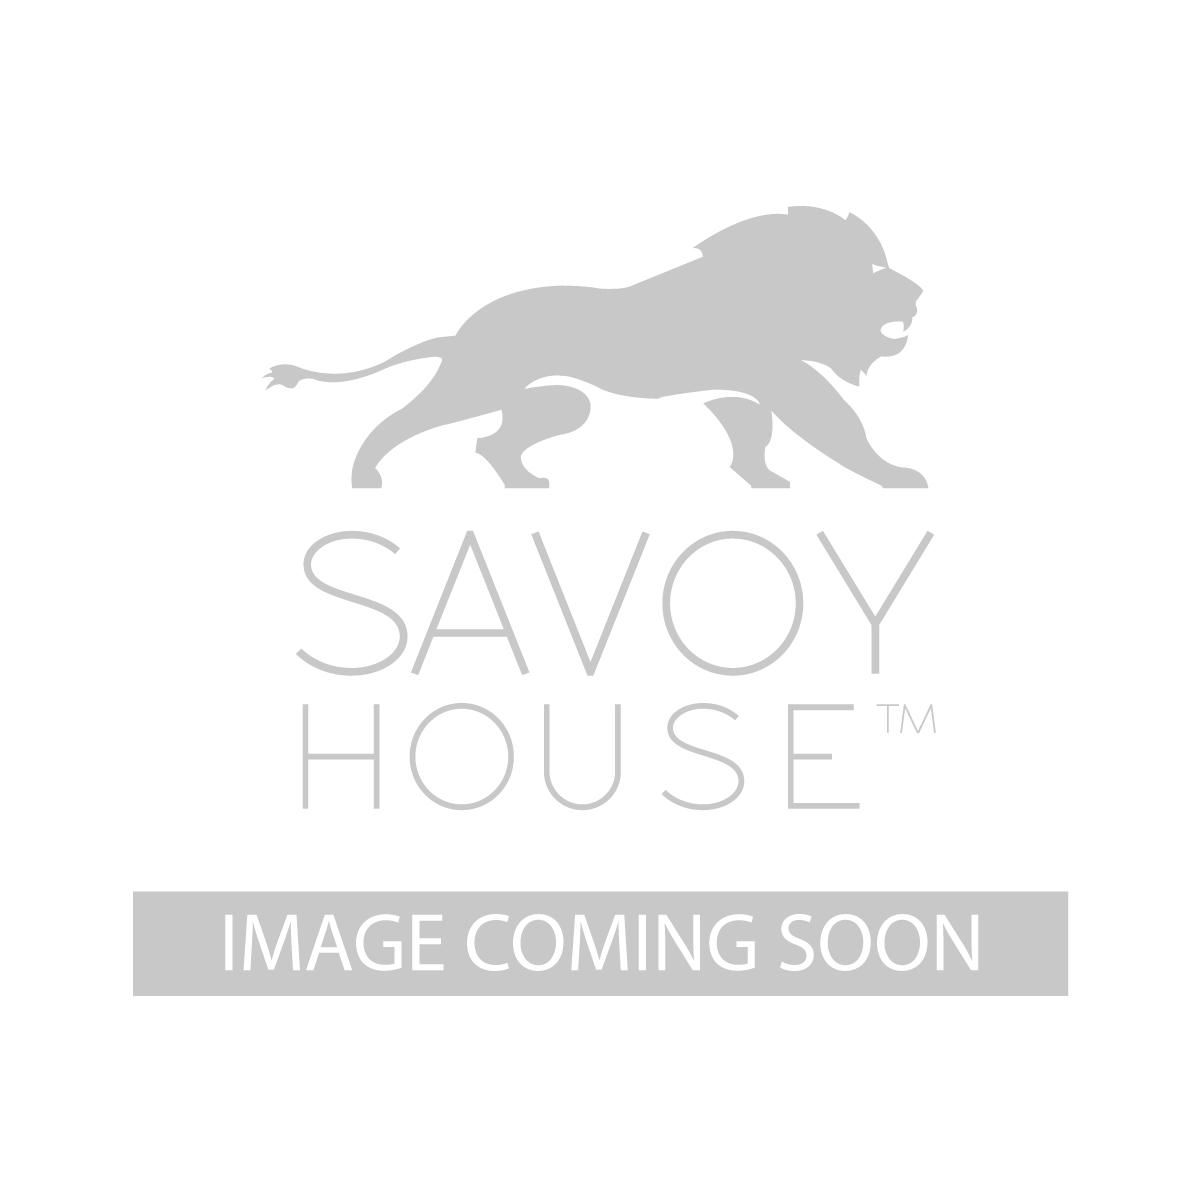 Berlin 9 Light Foyer  sc 1 st  Savoy House & 3-823-9-212 Berlin 9 Light Foyer by Savoy House